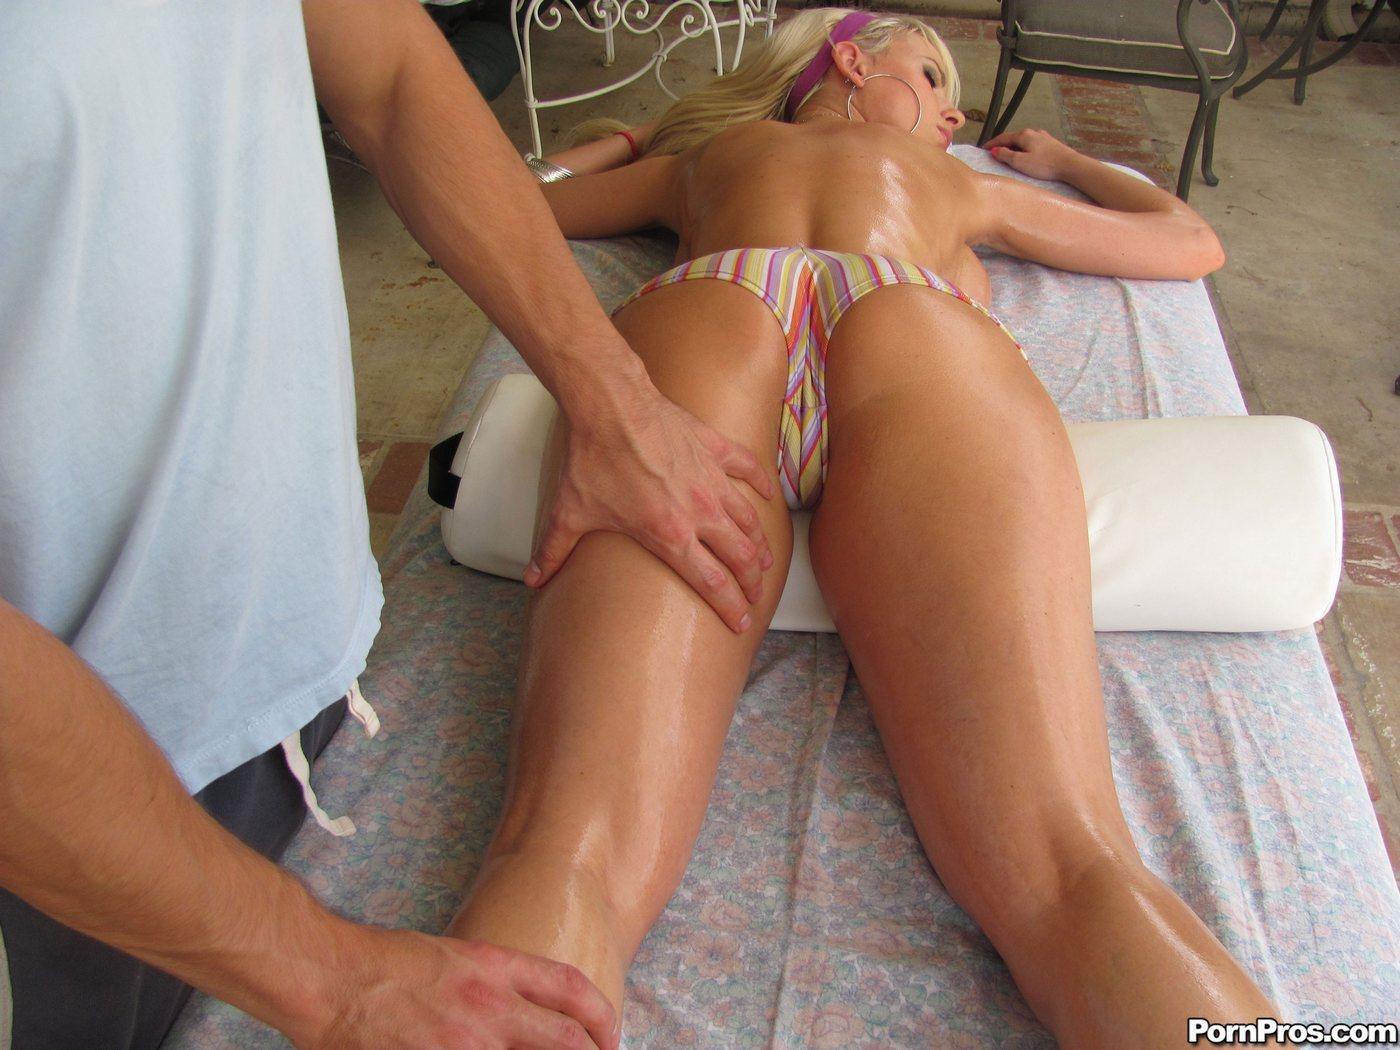 bdsm portal tantra massage movie